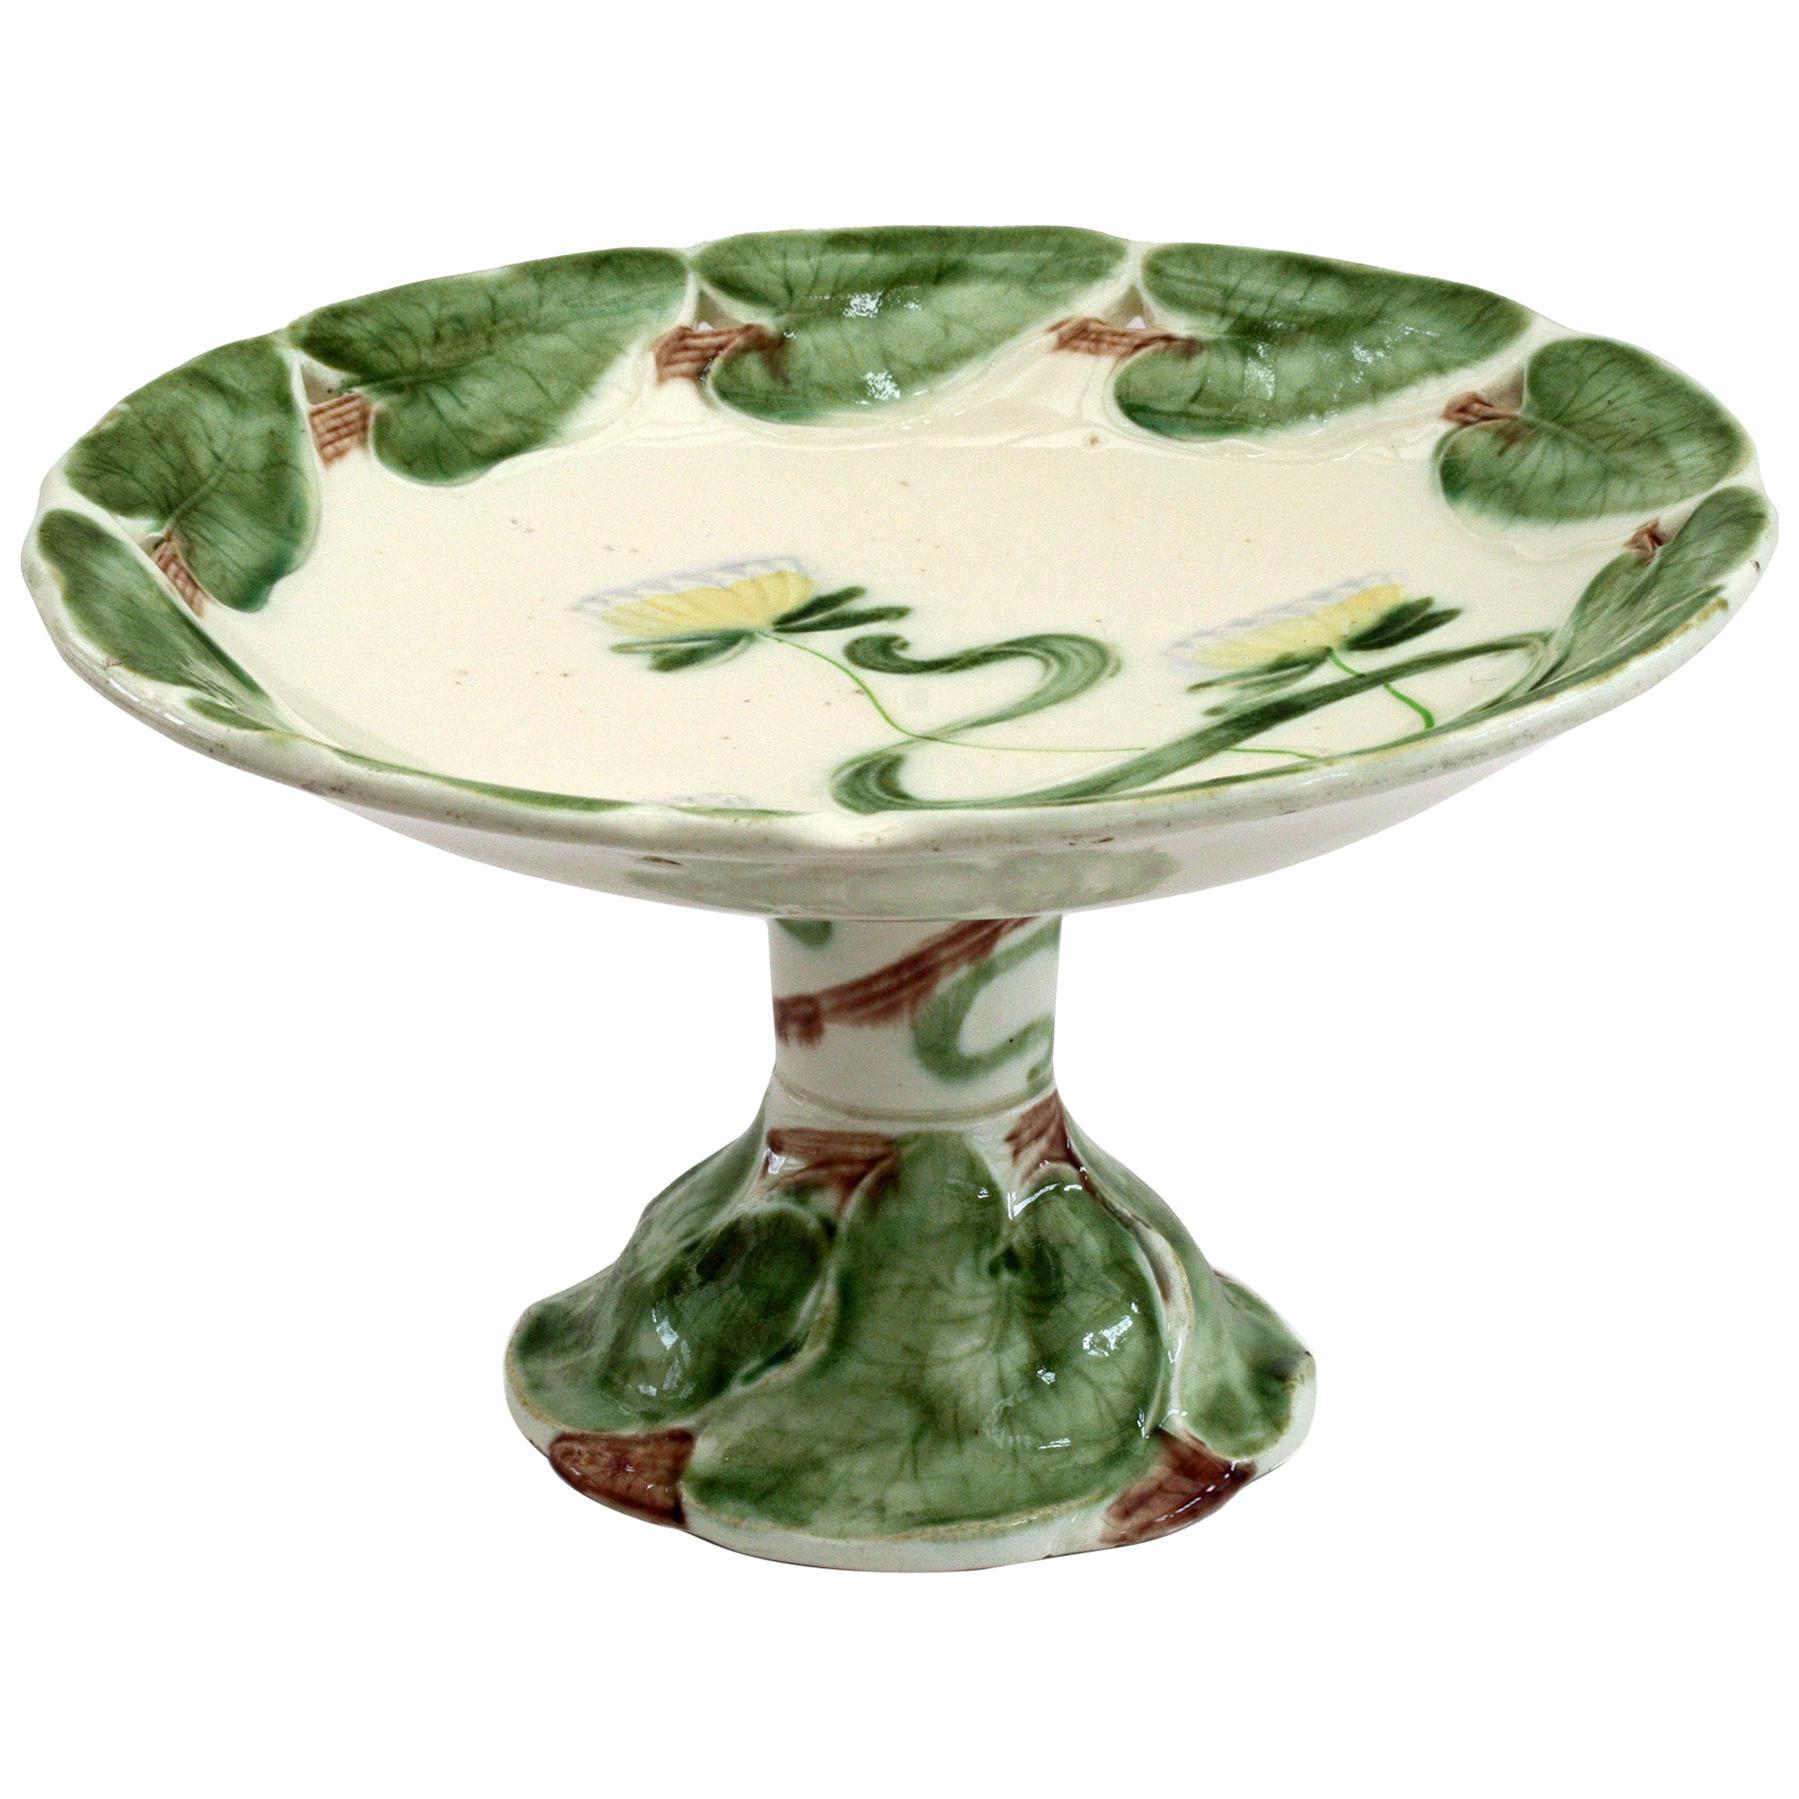 Villeroy & Boch Art Nouveau Tubelined Floral Majolica Pottery Tazza